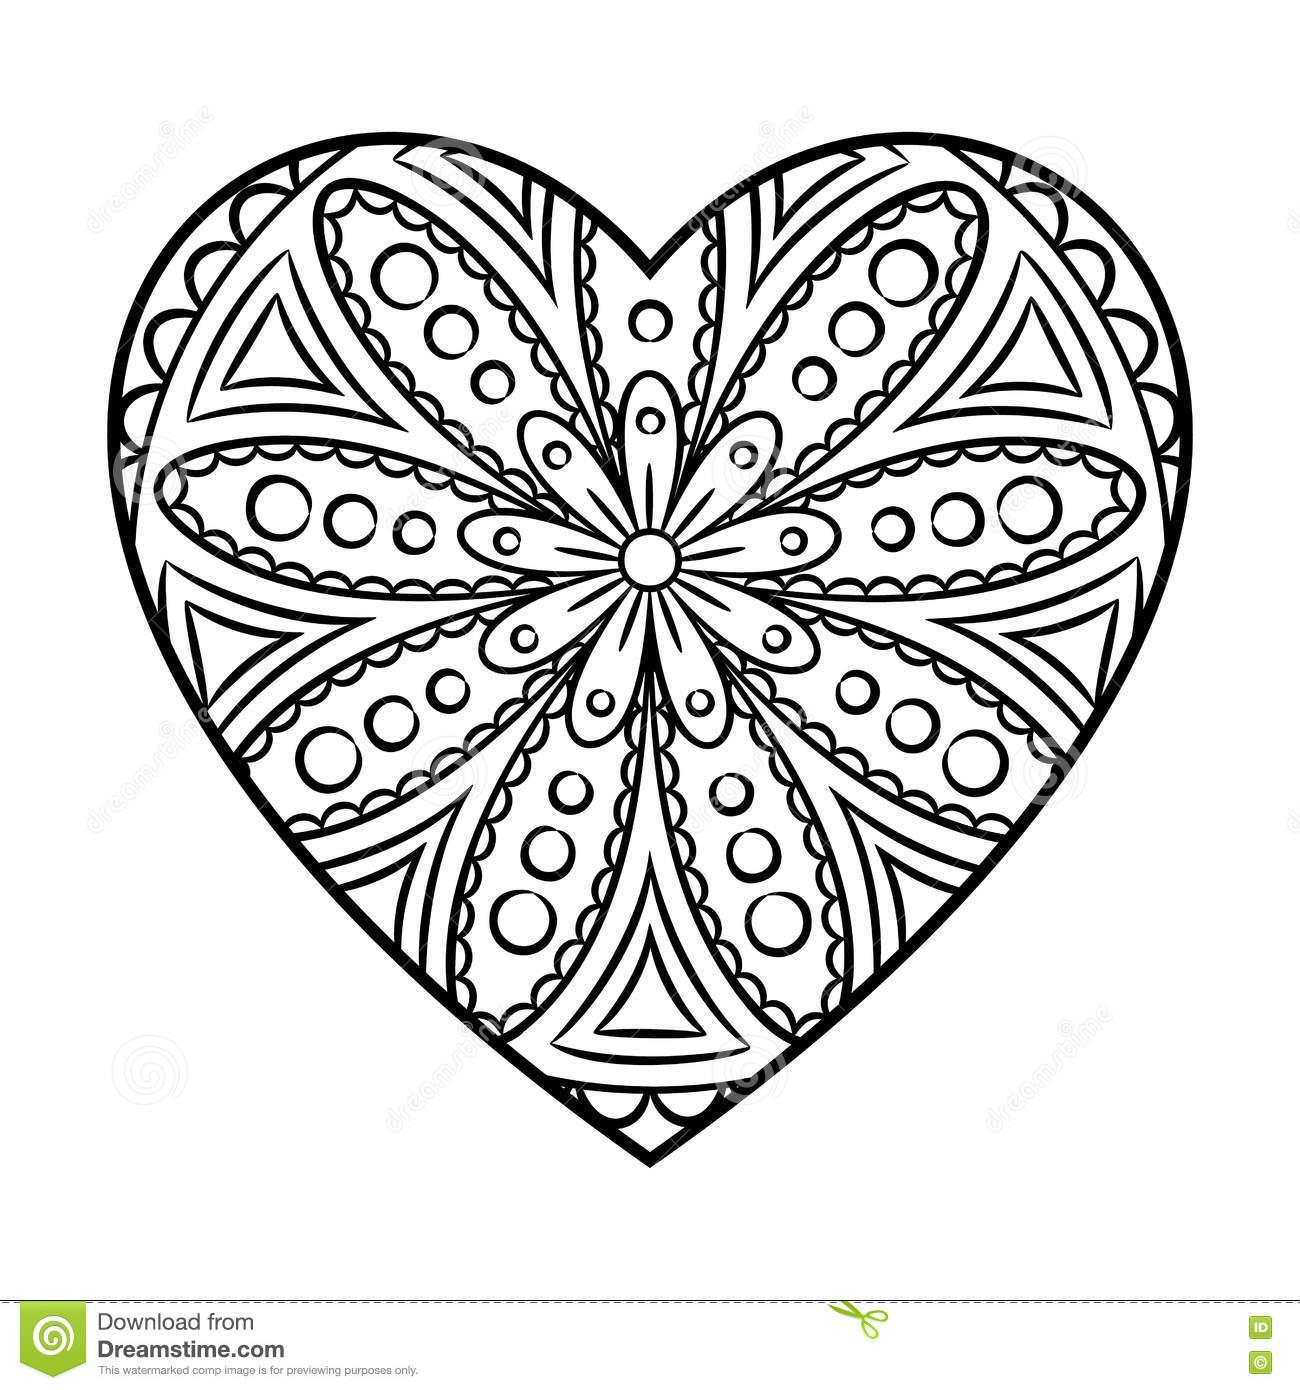 heart mandala clipart - Clipground